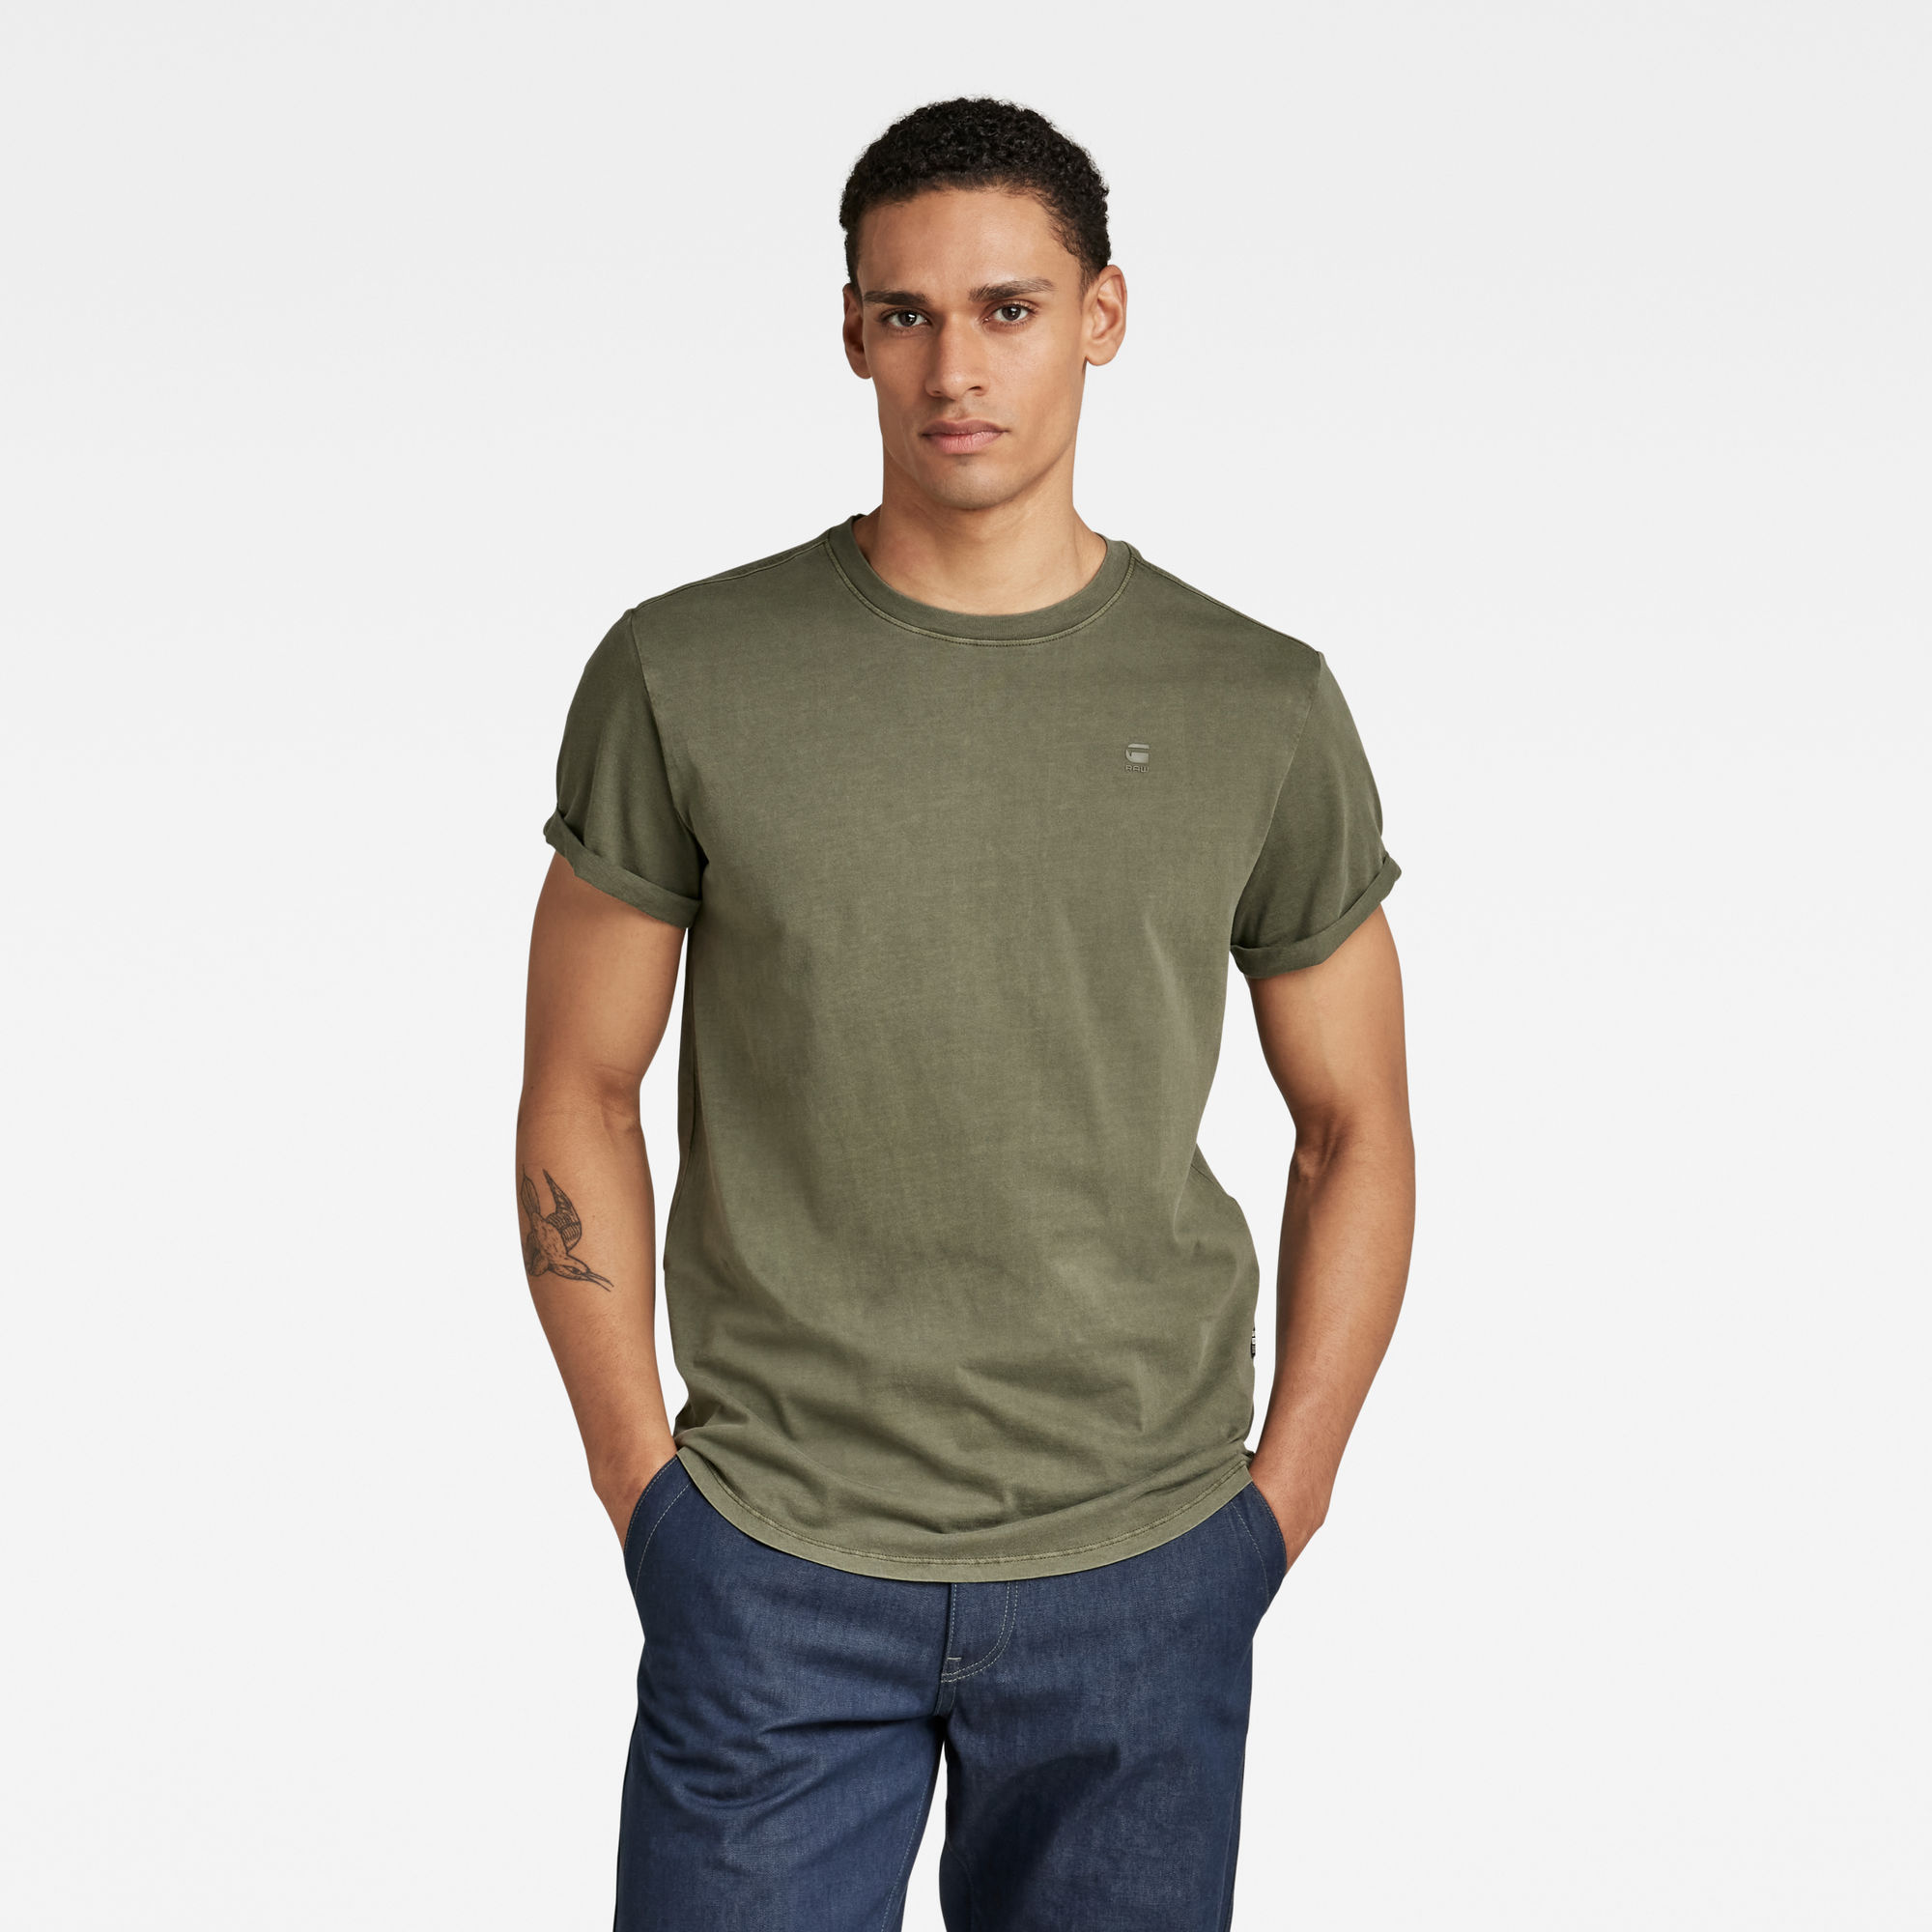 G-Star RAW Heren Lash T-Shirt Groen